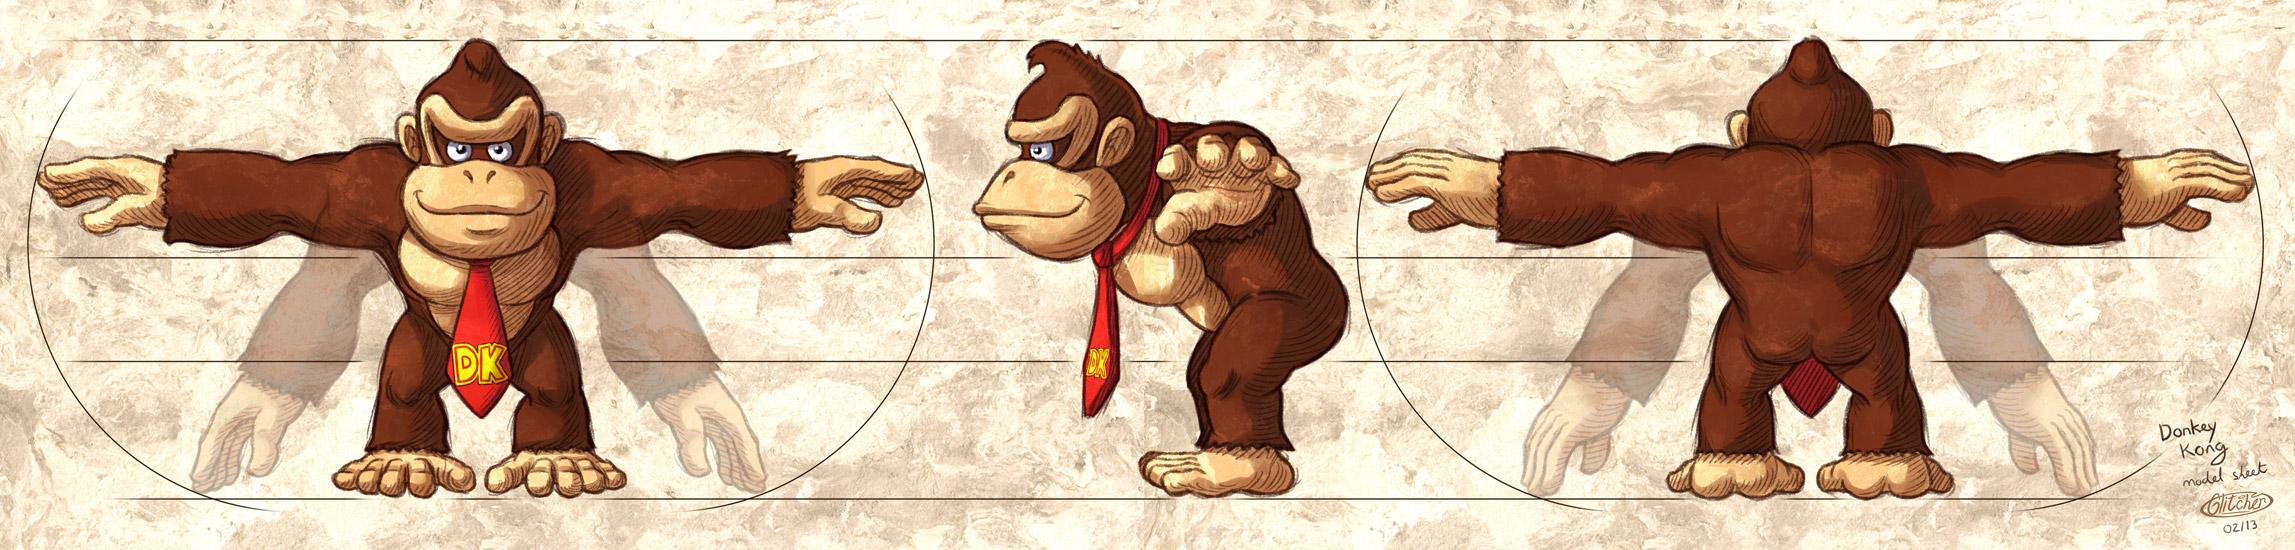 Donkey Kong model sheet by glitcher